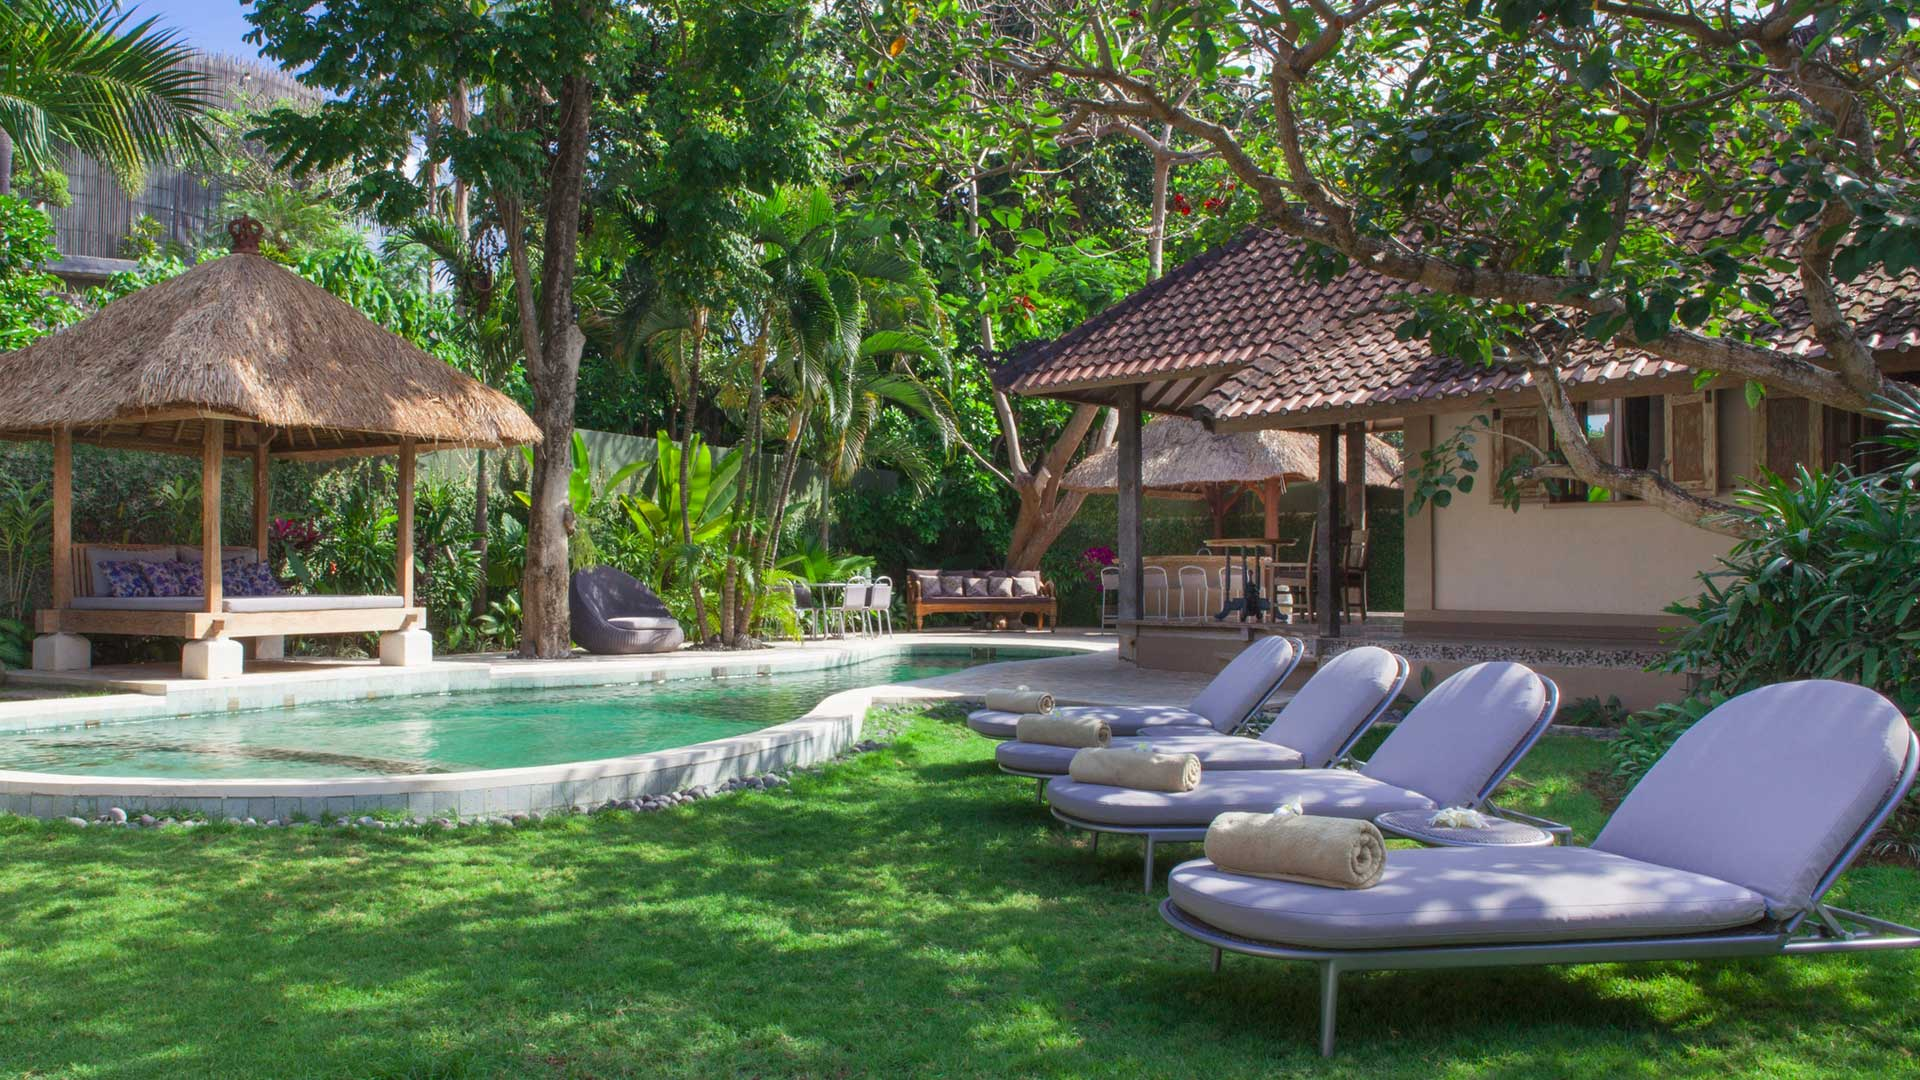 Villa koyama villa louer bali sud ouest seminyak Villa a louer bali